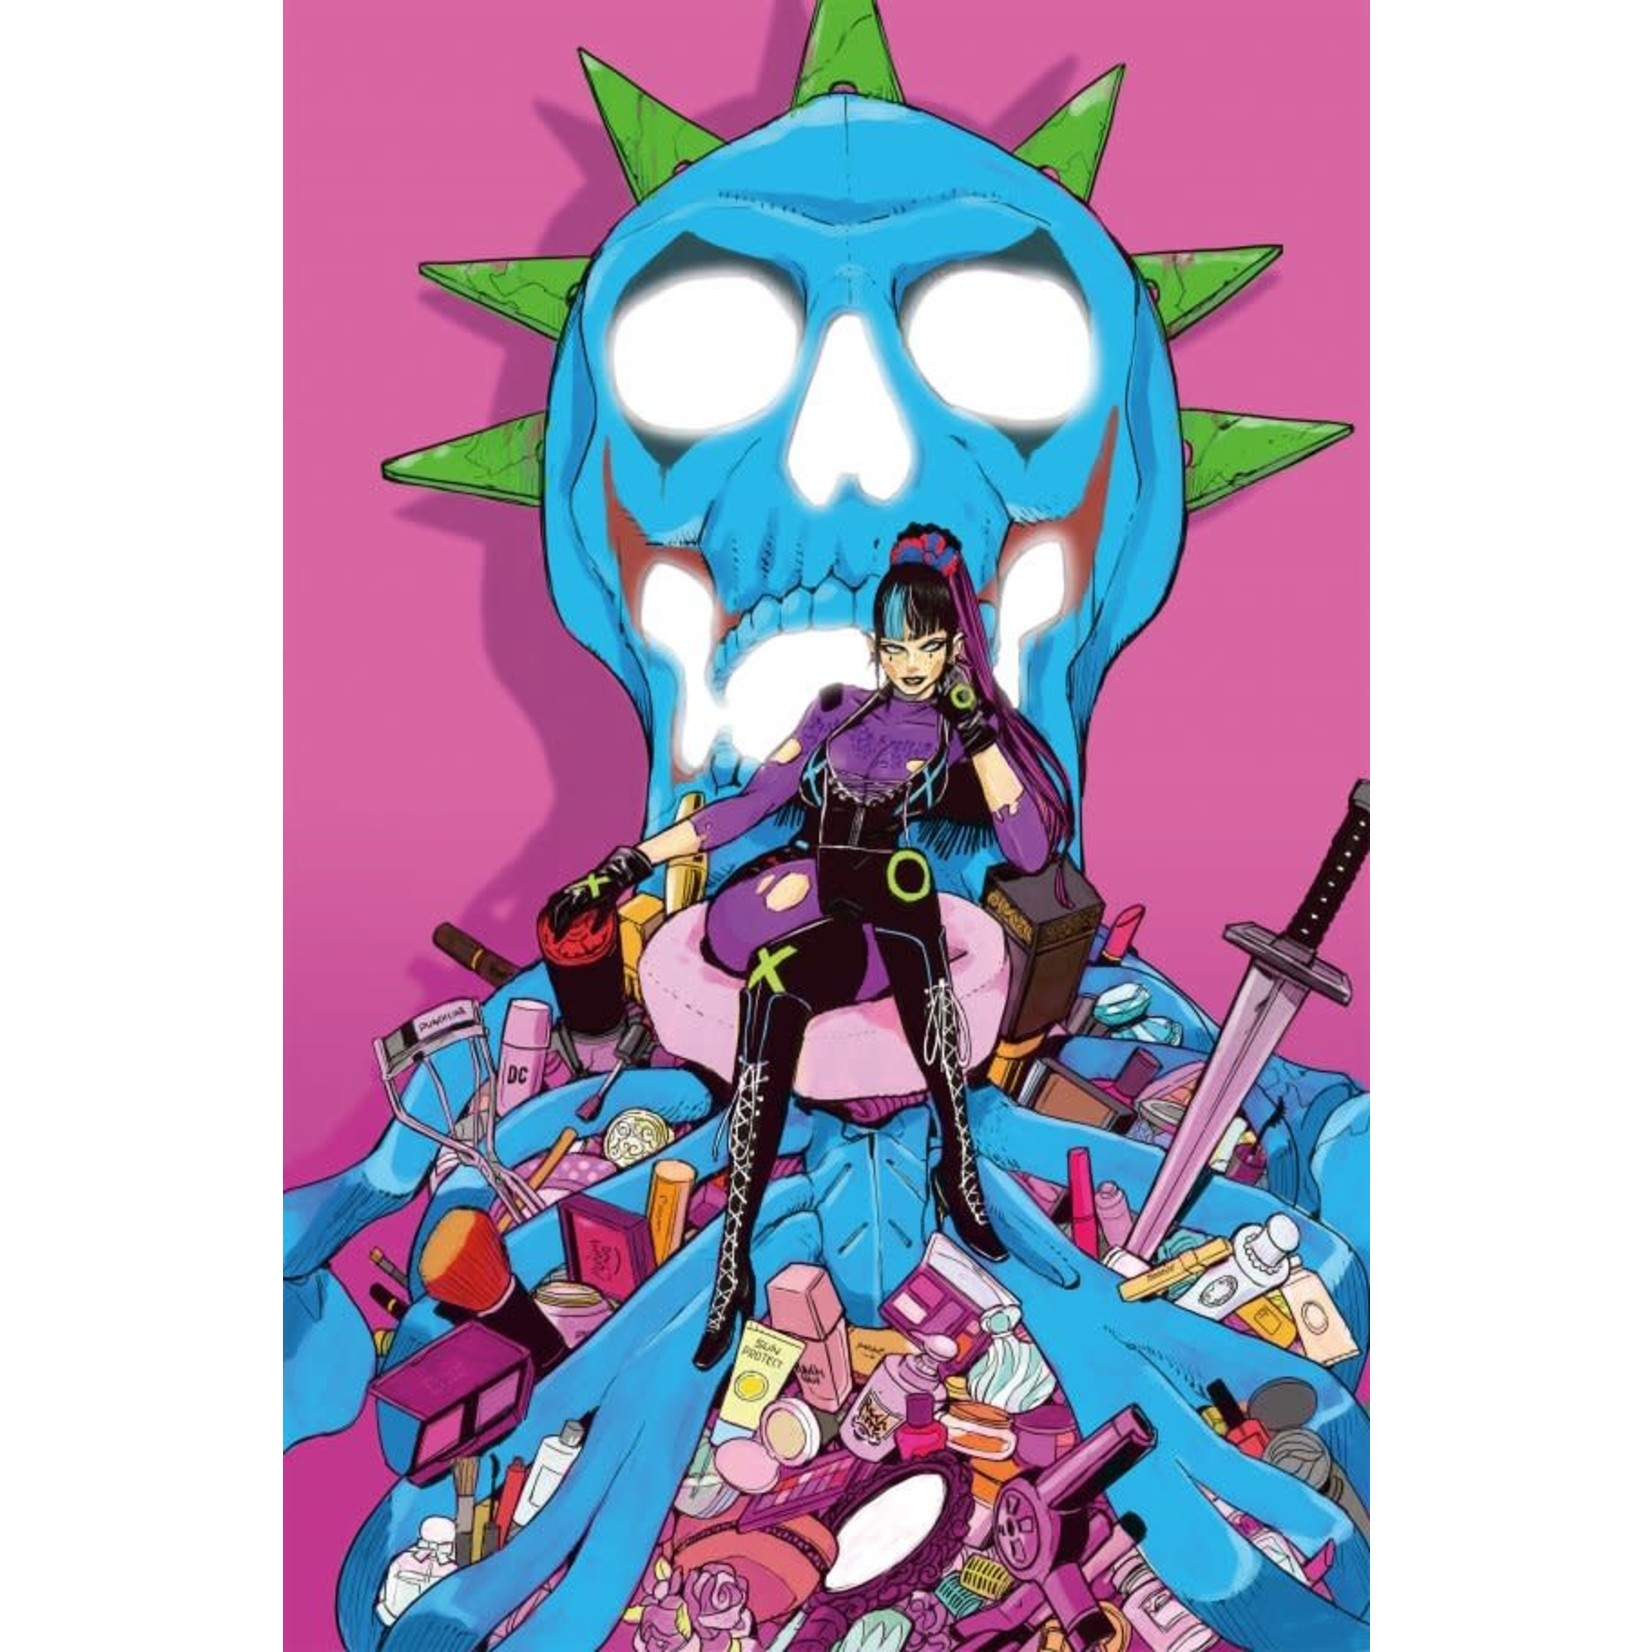 DC Comics The Joker #8 Cover C Bright